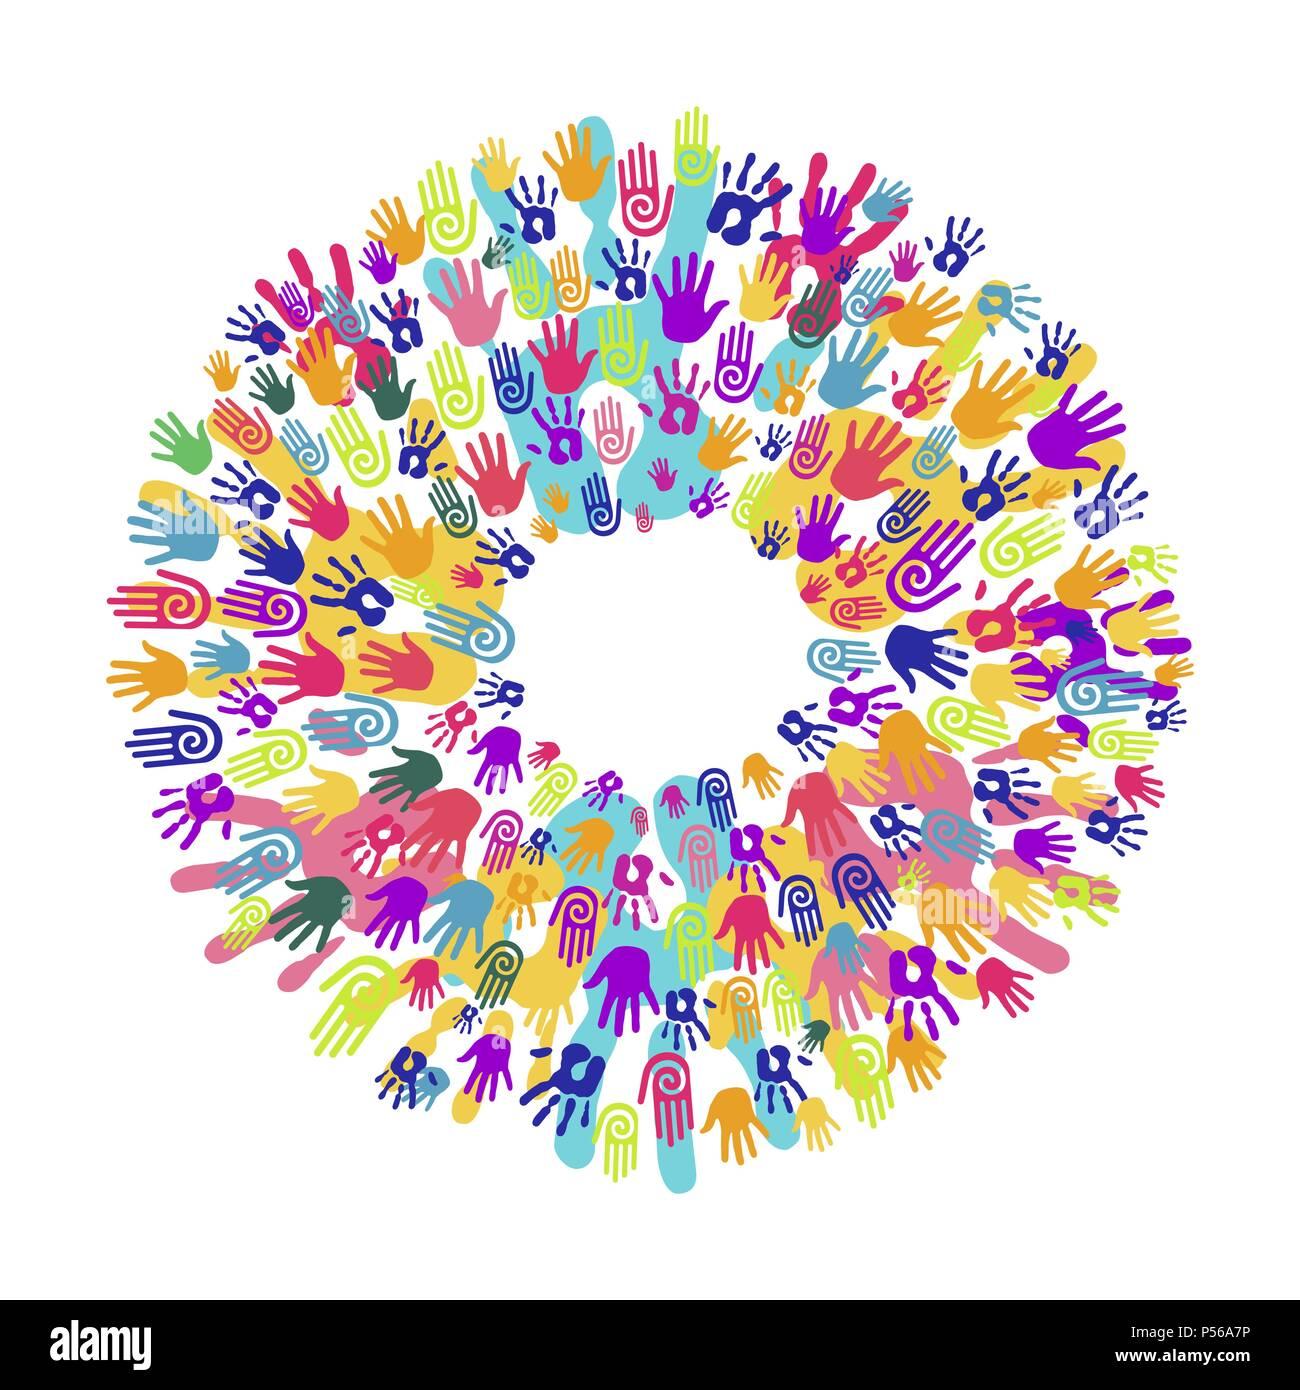 Colorful Human Hand Print Mandala Community Team Concept